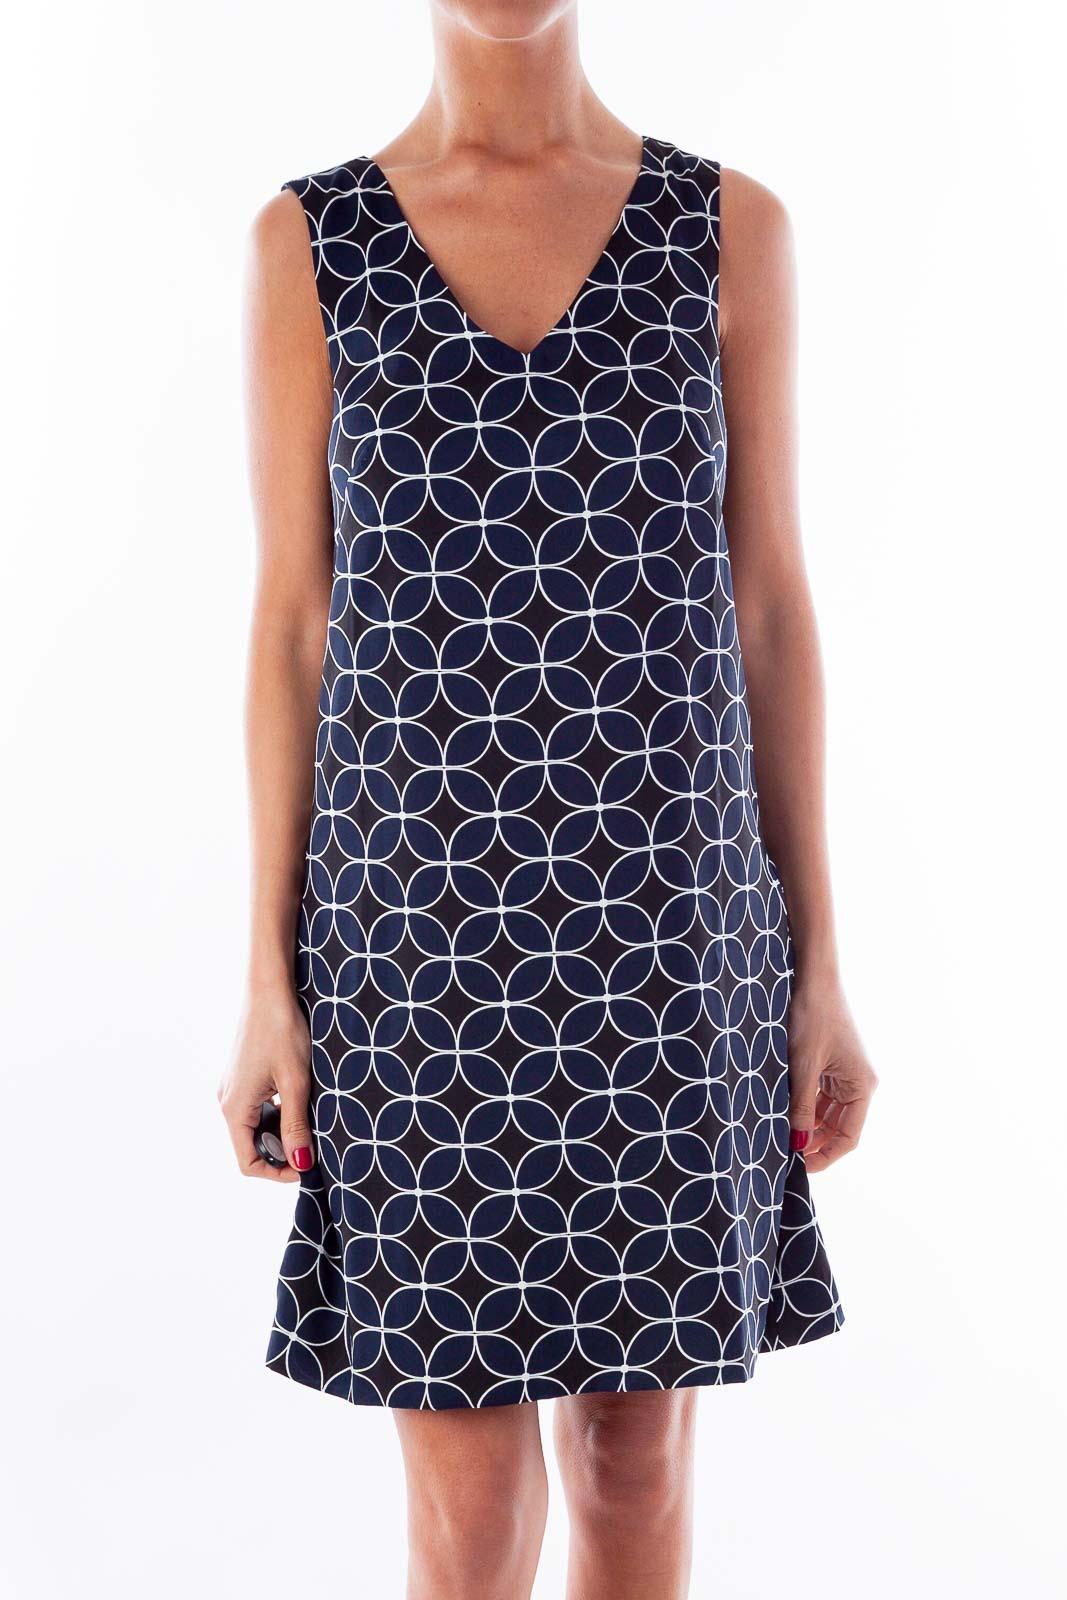 Navy & Black Circle Print Shift Dress